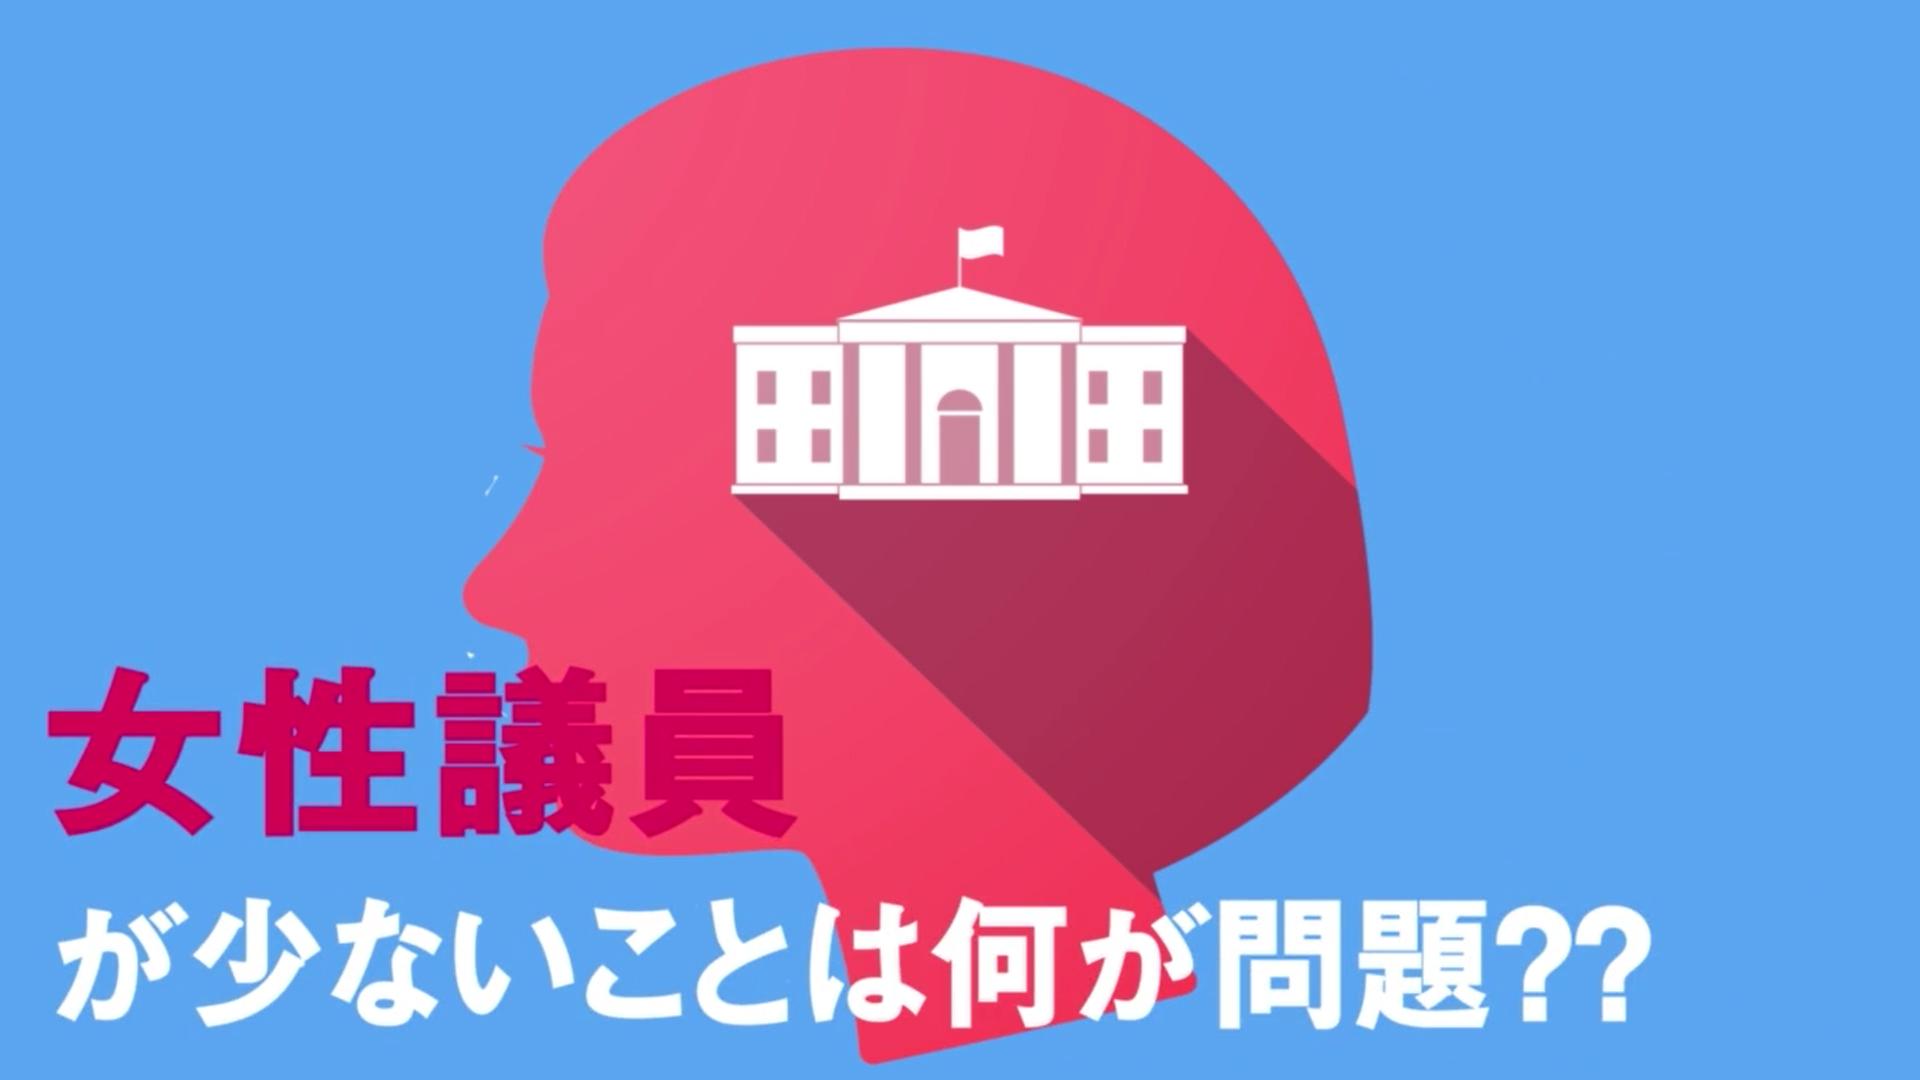 513ff6bd1e17a321d84195cda7f5f70b - 日本政治は歪なジェンダーデモクラシー